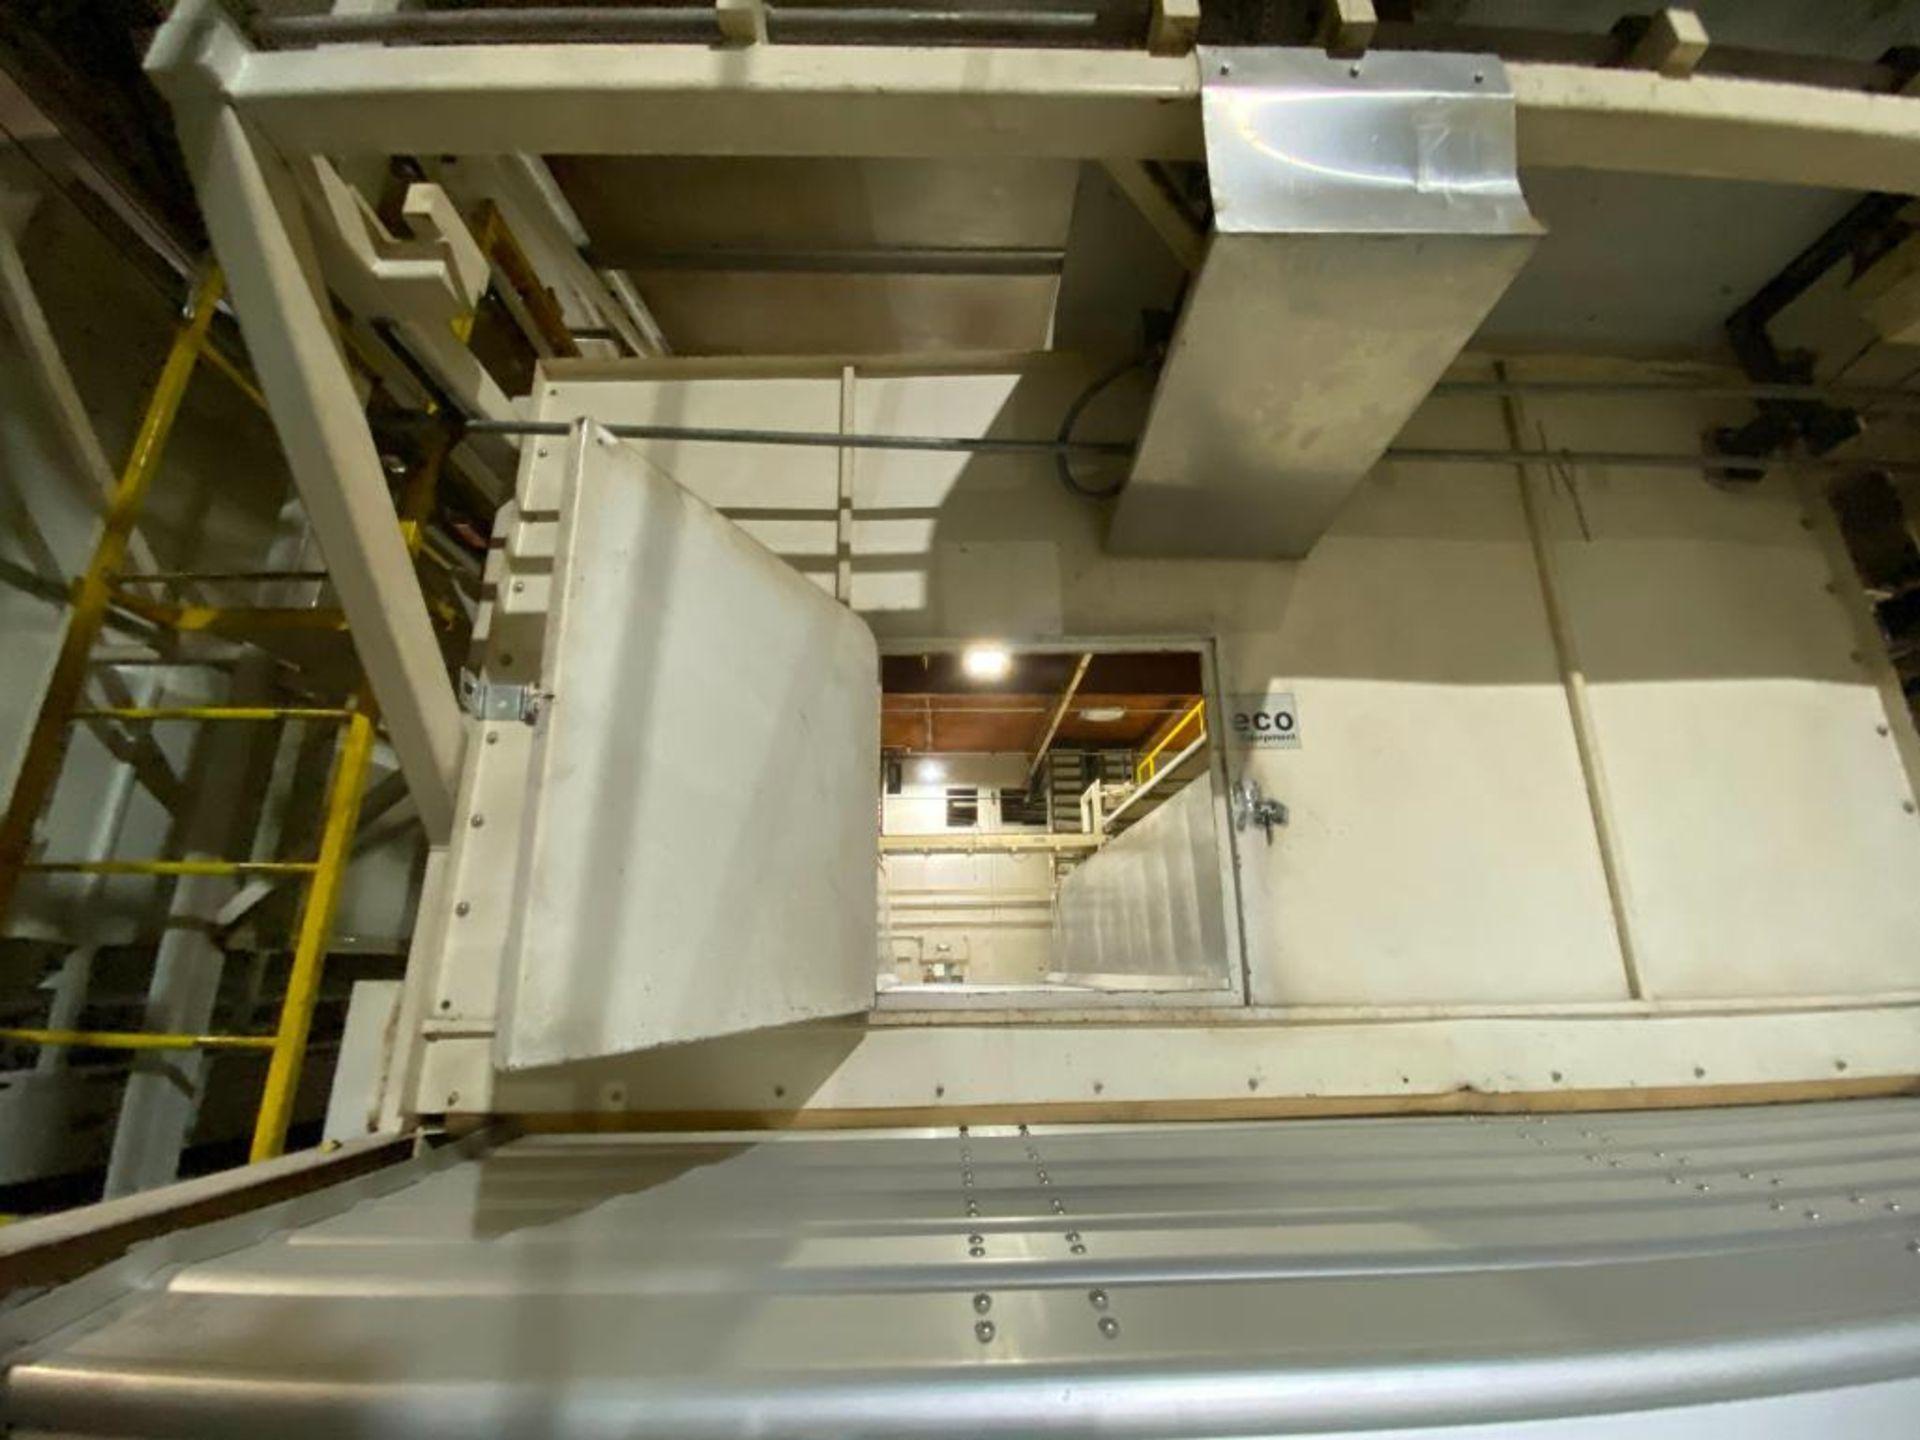 Aseeco bulk accumulation bin - Image 2 of 5